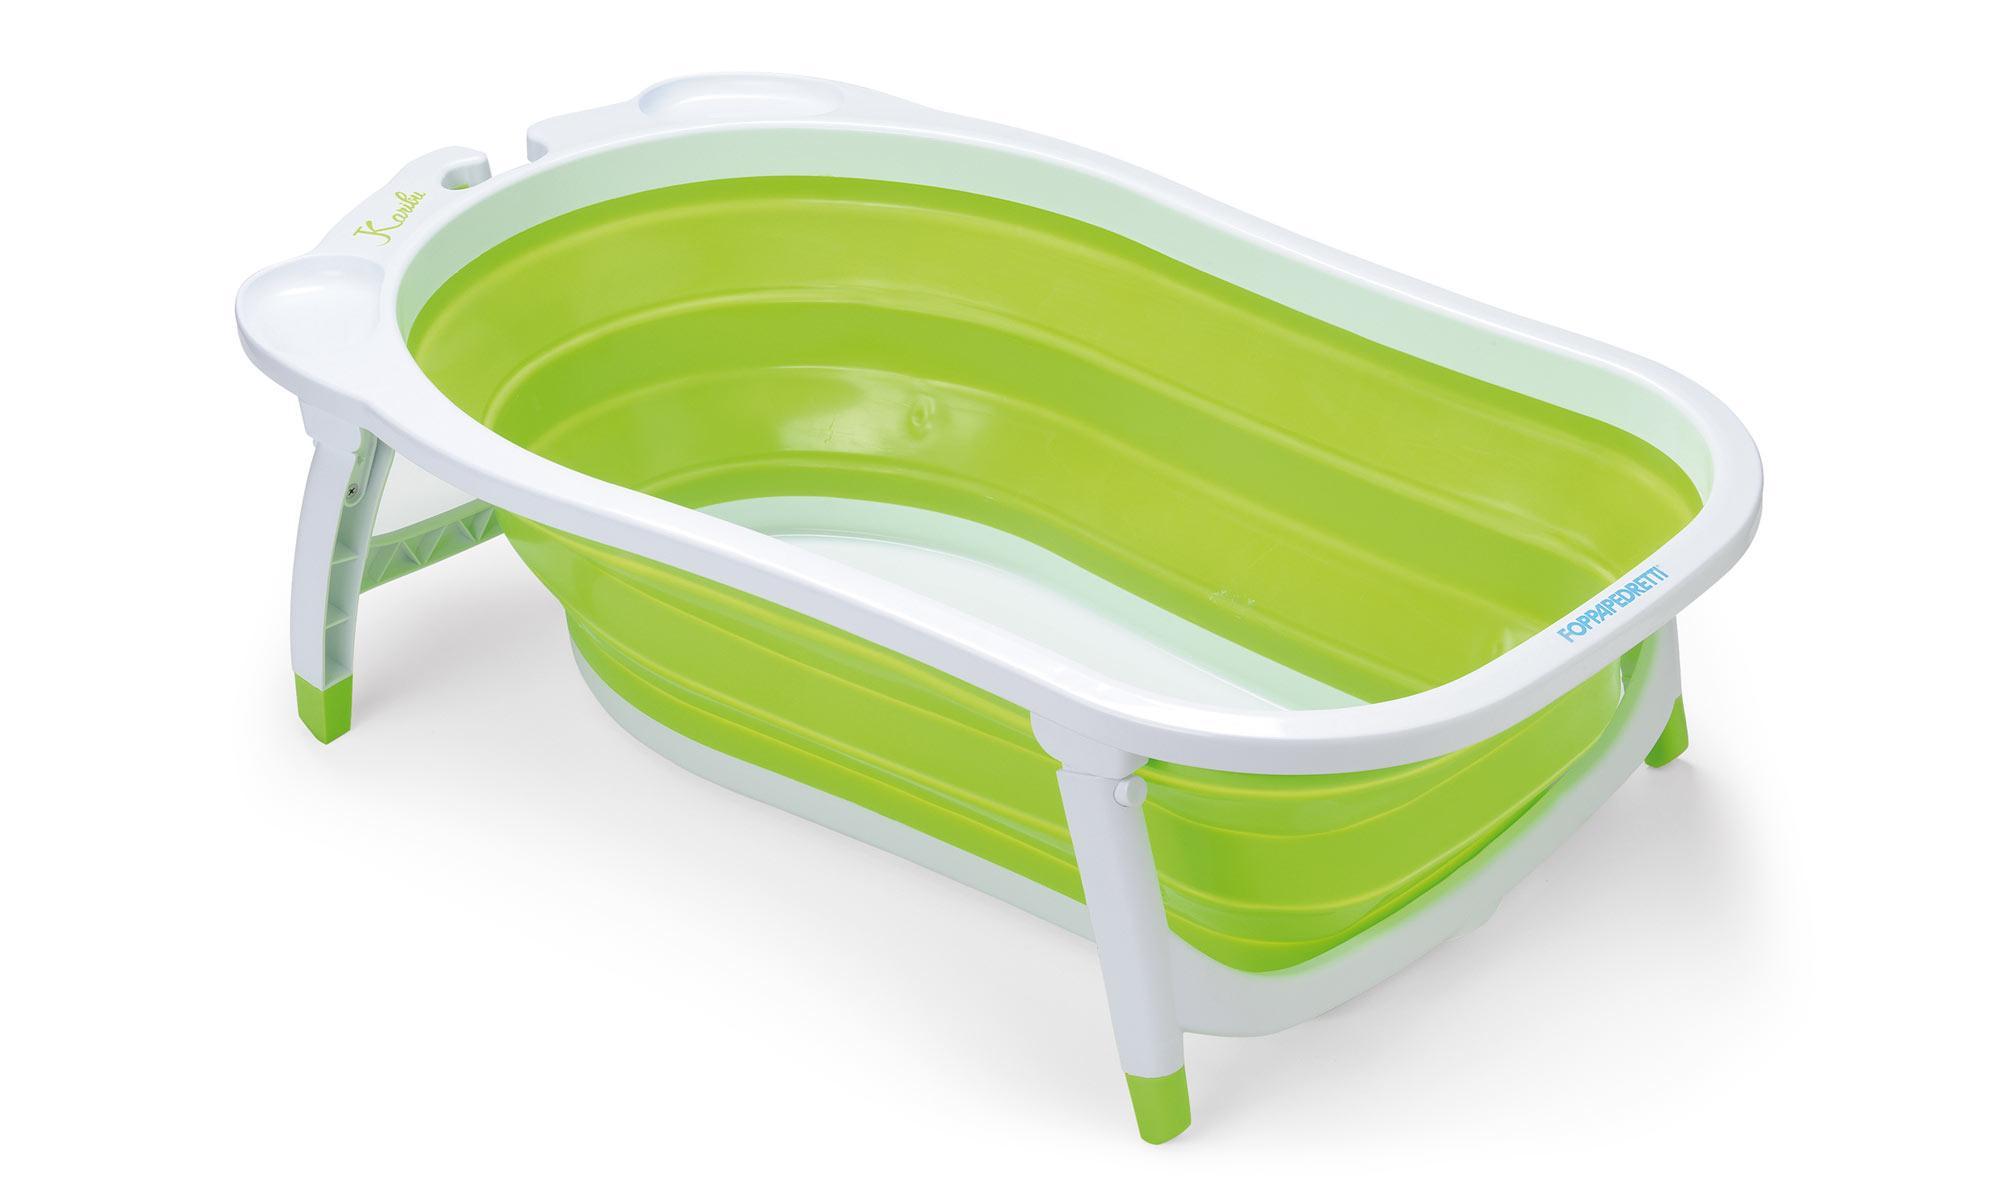 Vaschetta Per Bagno Bambino : Vasca da bagno per neonati pesaro posot class vaschetta bagno